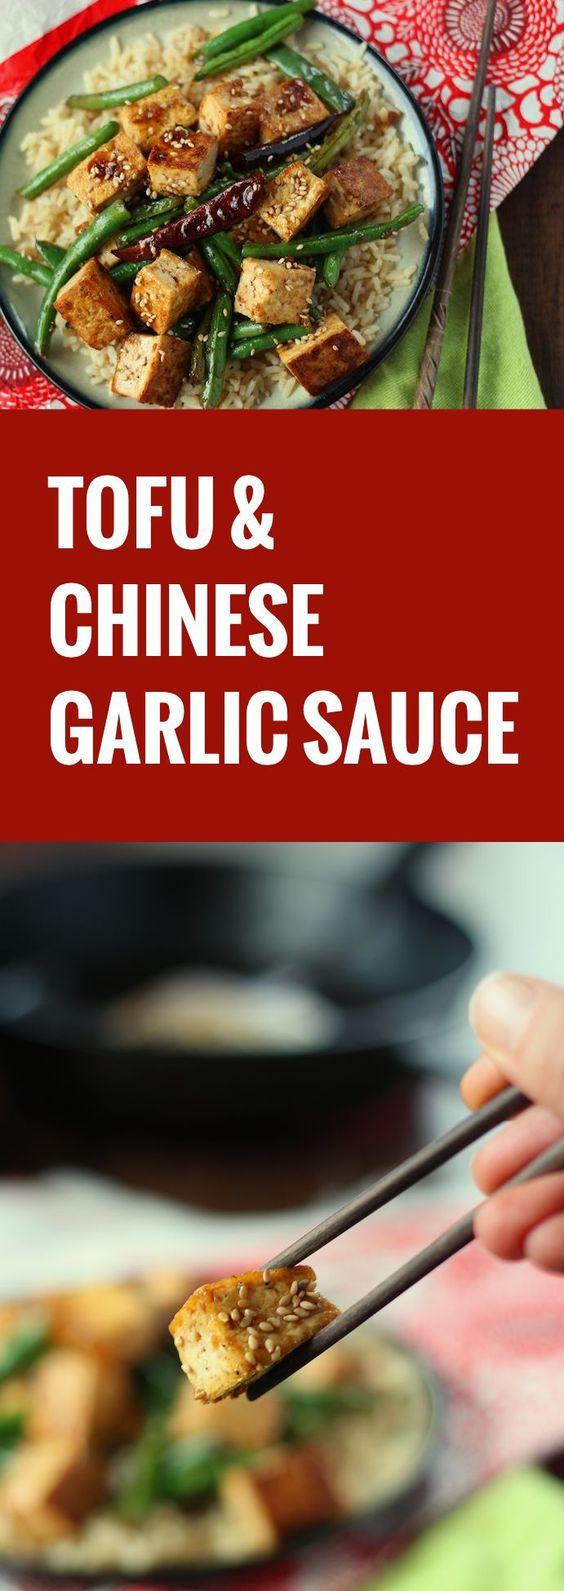 Panfried Tofu With Chinese Black Bean Sauce Recipe — Dishmaps